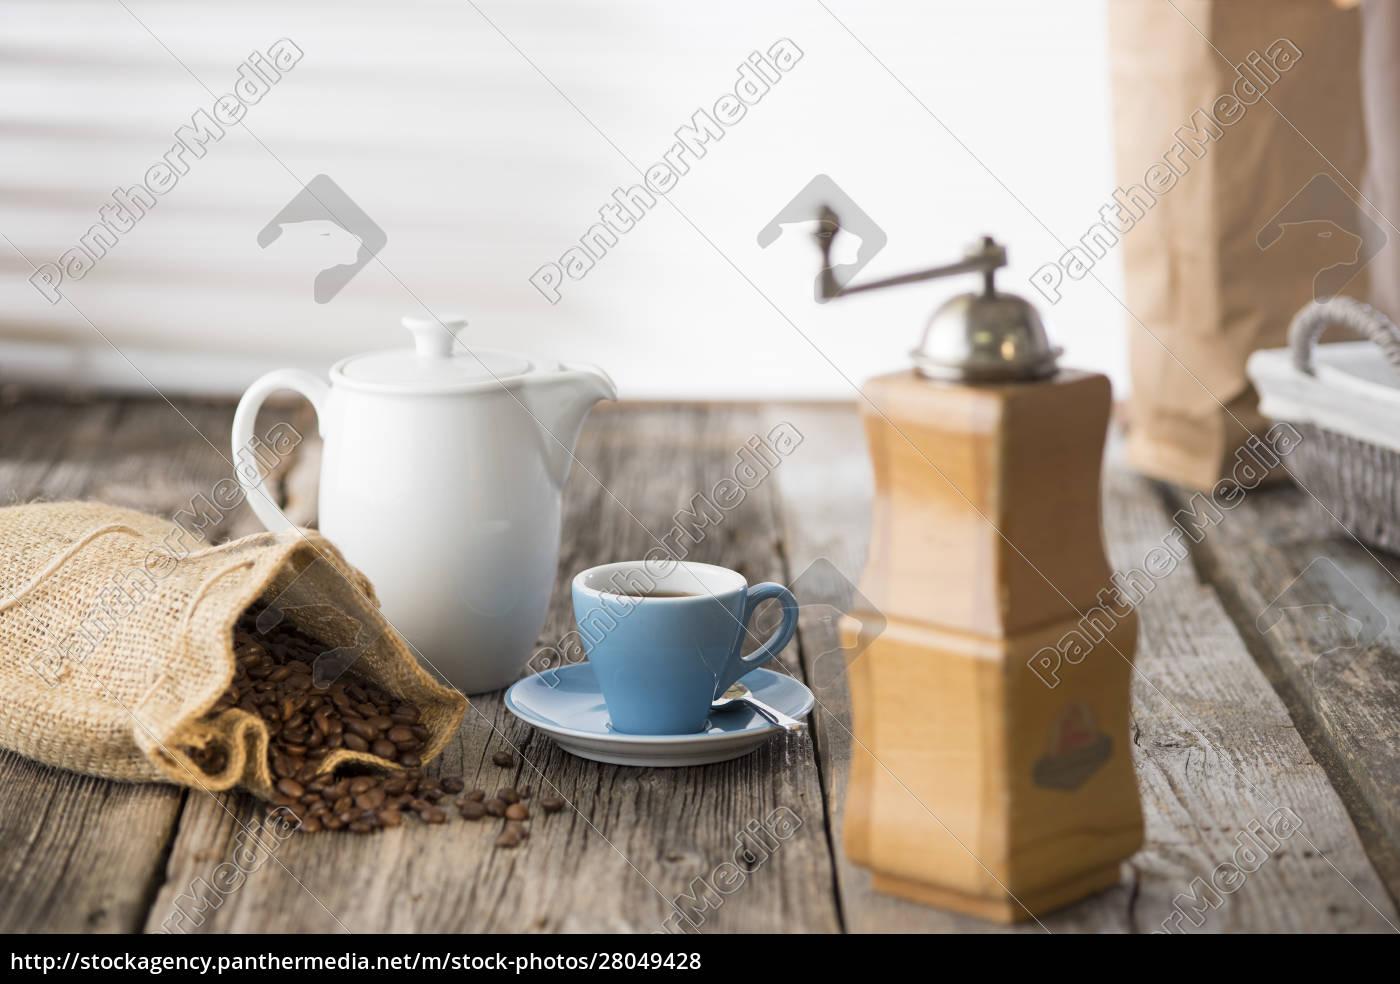 germania, alta, baviera, baviera, caffè, natura, morta - 28049428